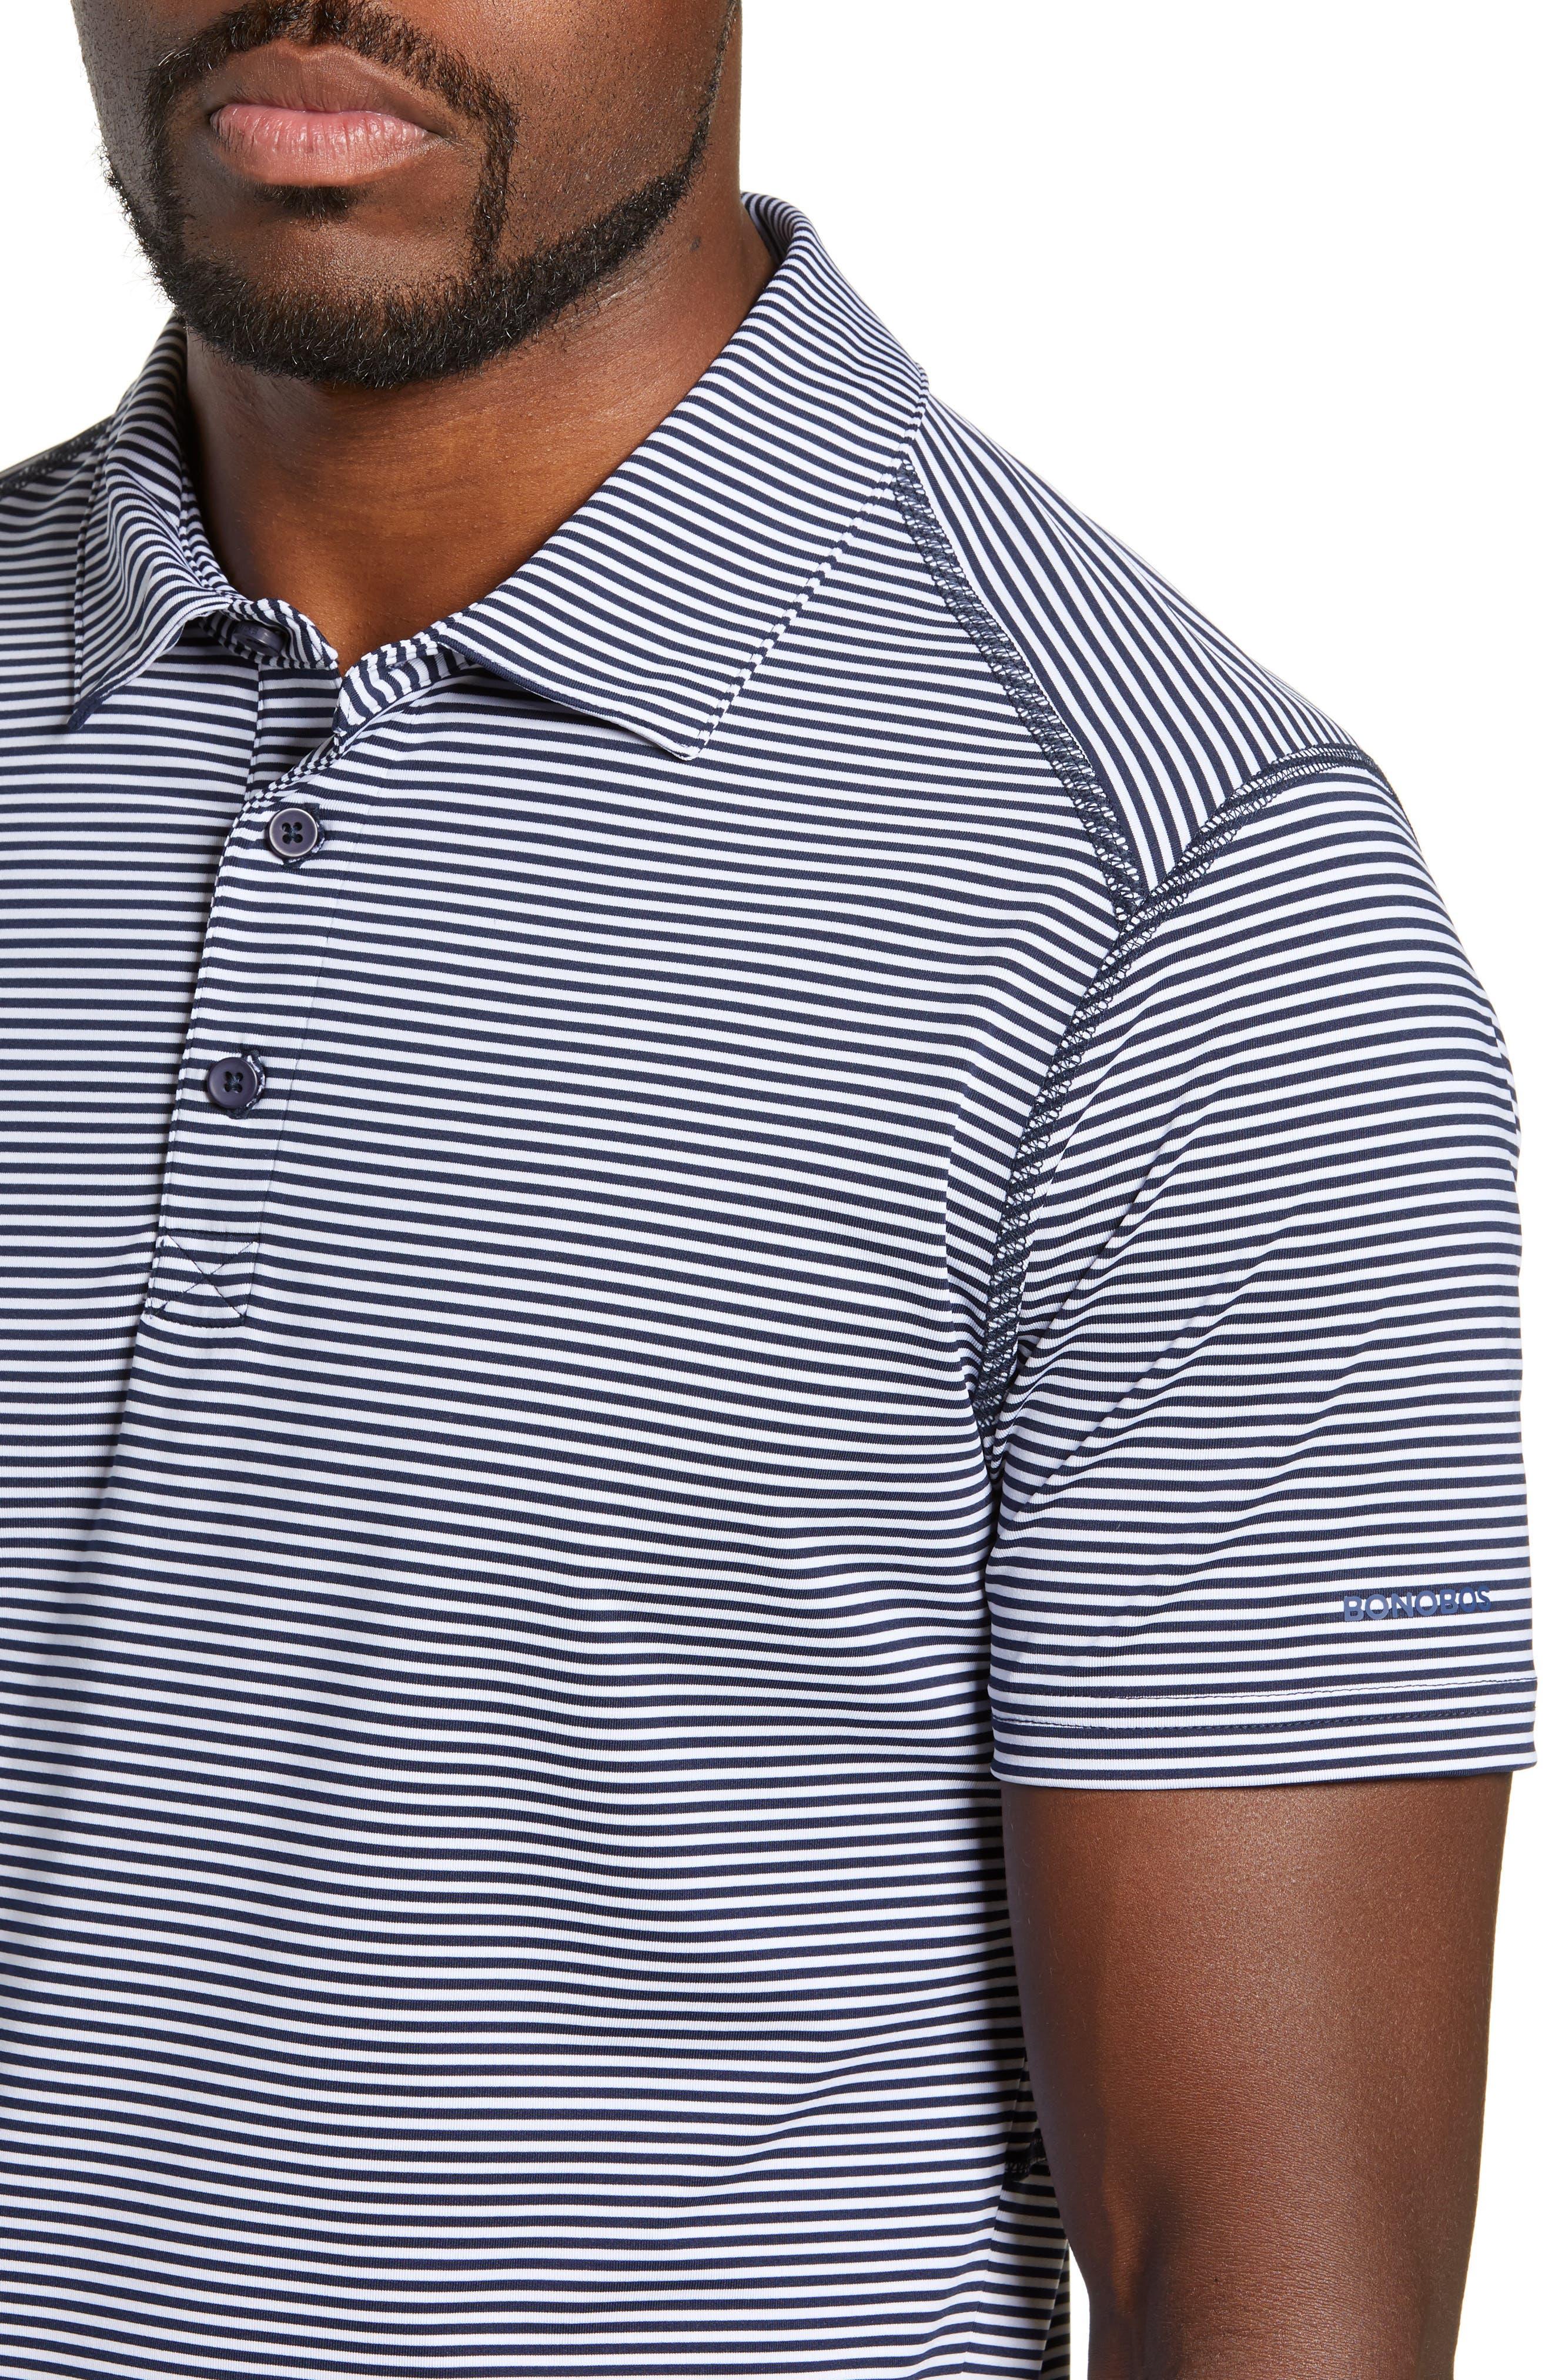 Flatiron Slim Fit Jacquard Jersey Polo,                             Alternate thumbnail 4, color,                             NAVY/ WHITE